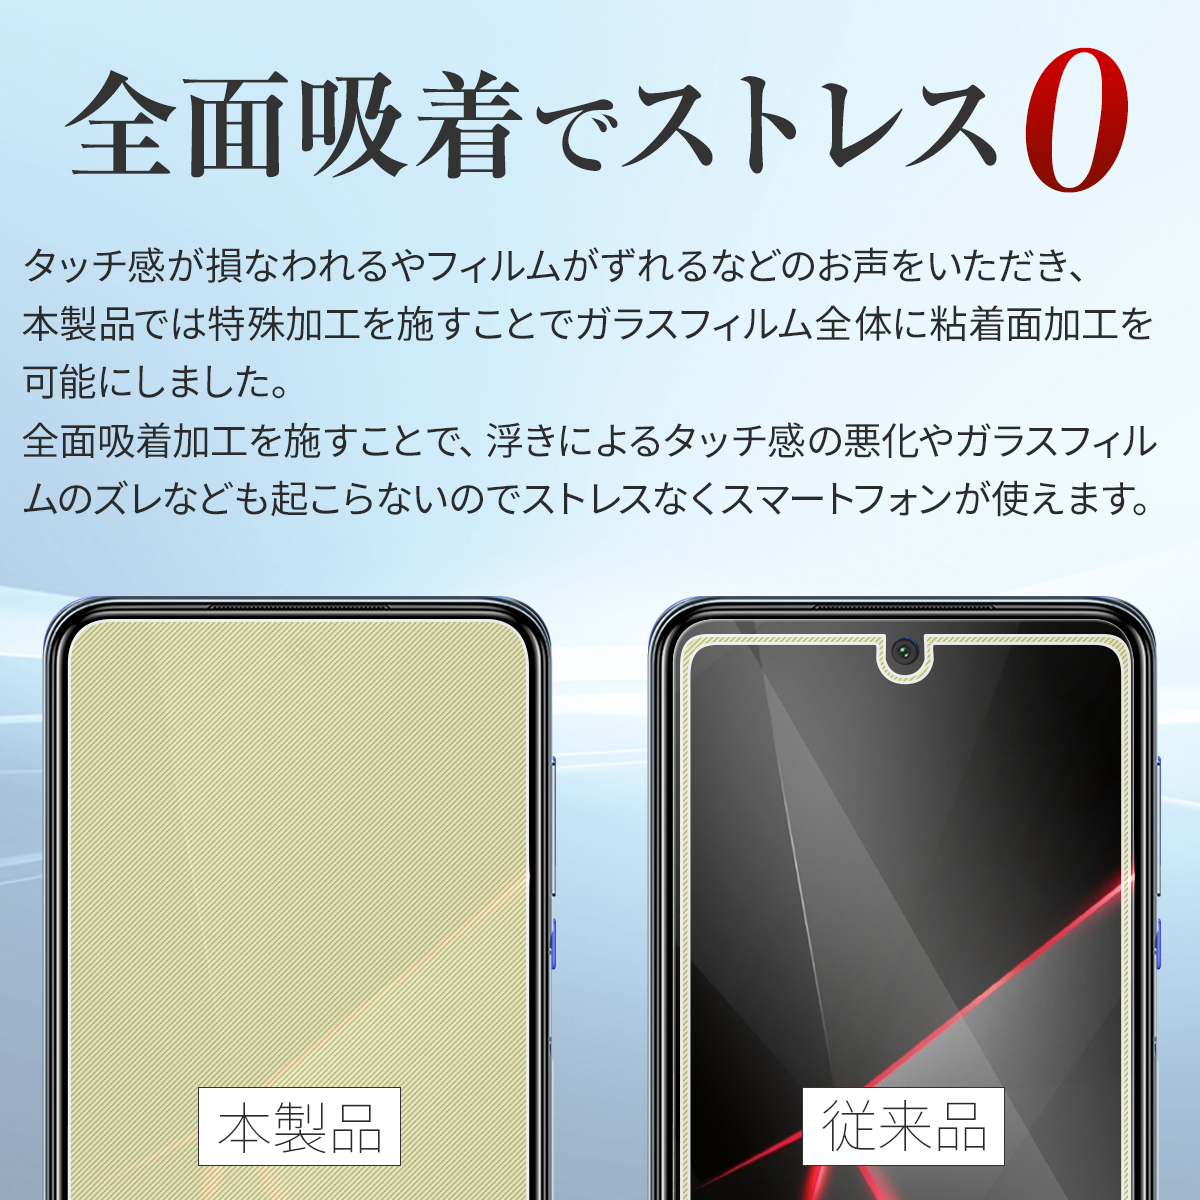 Redmi Note 9S 強化ガラス保護フィルム 9H